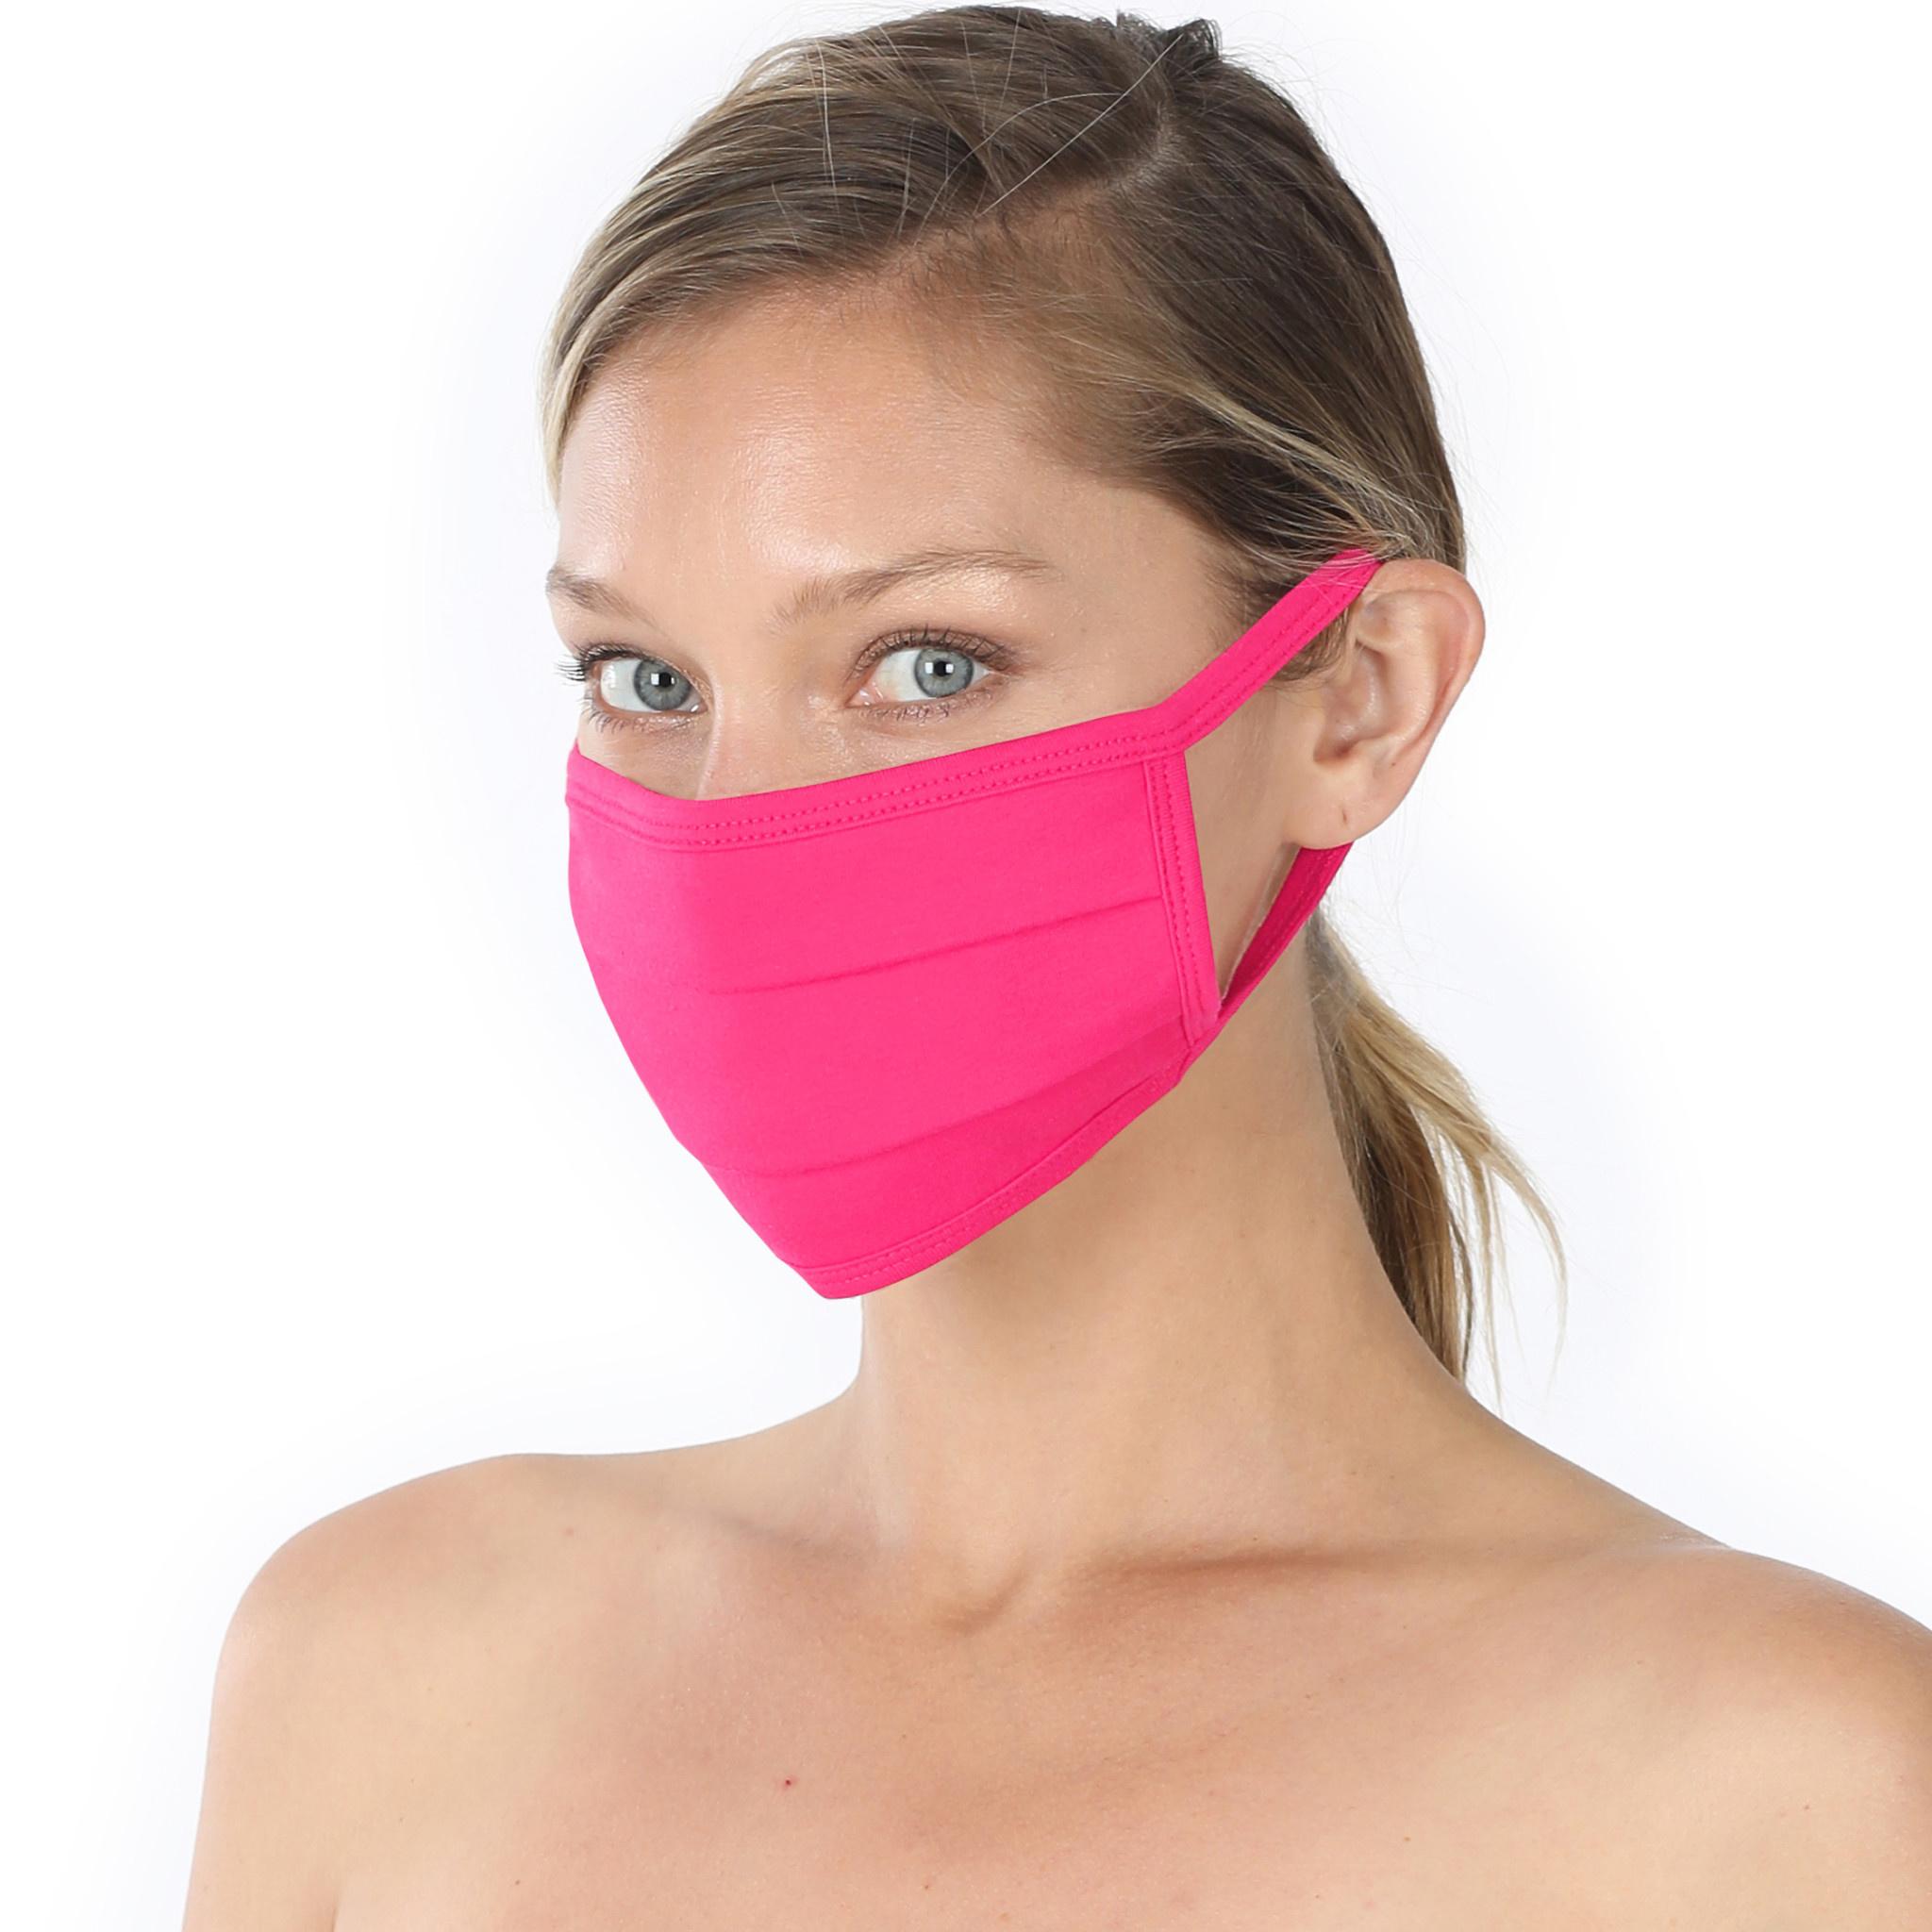 Fleurish Home Simple Cotton Fashion Mask: Hot Pink